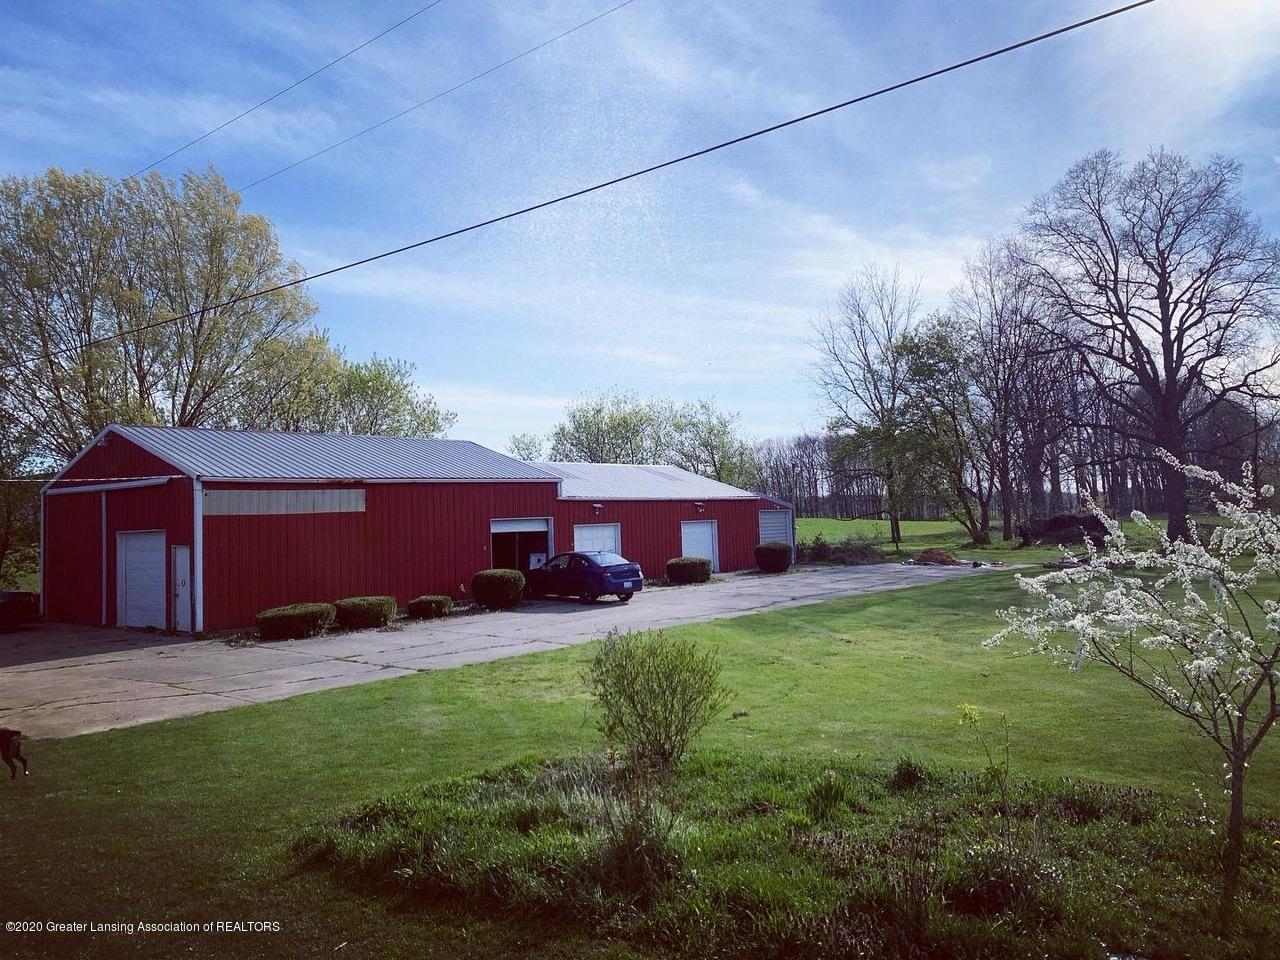 2096 S Perkey Rd - Pole barn - 43